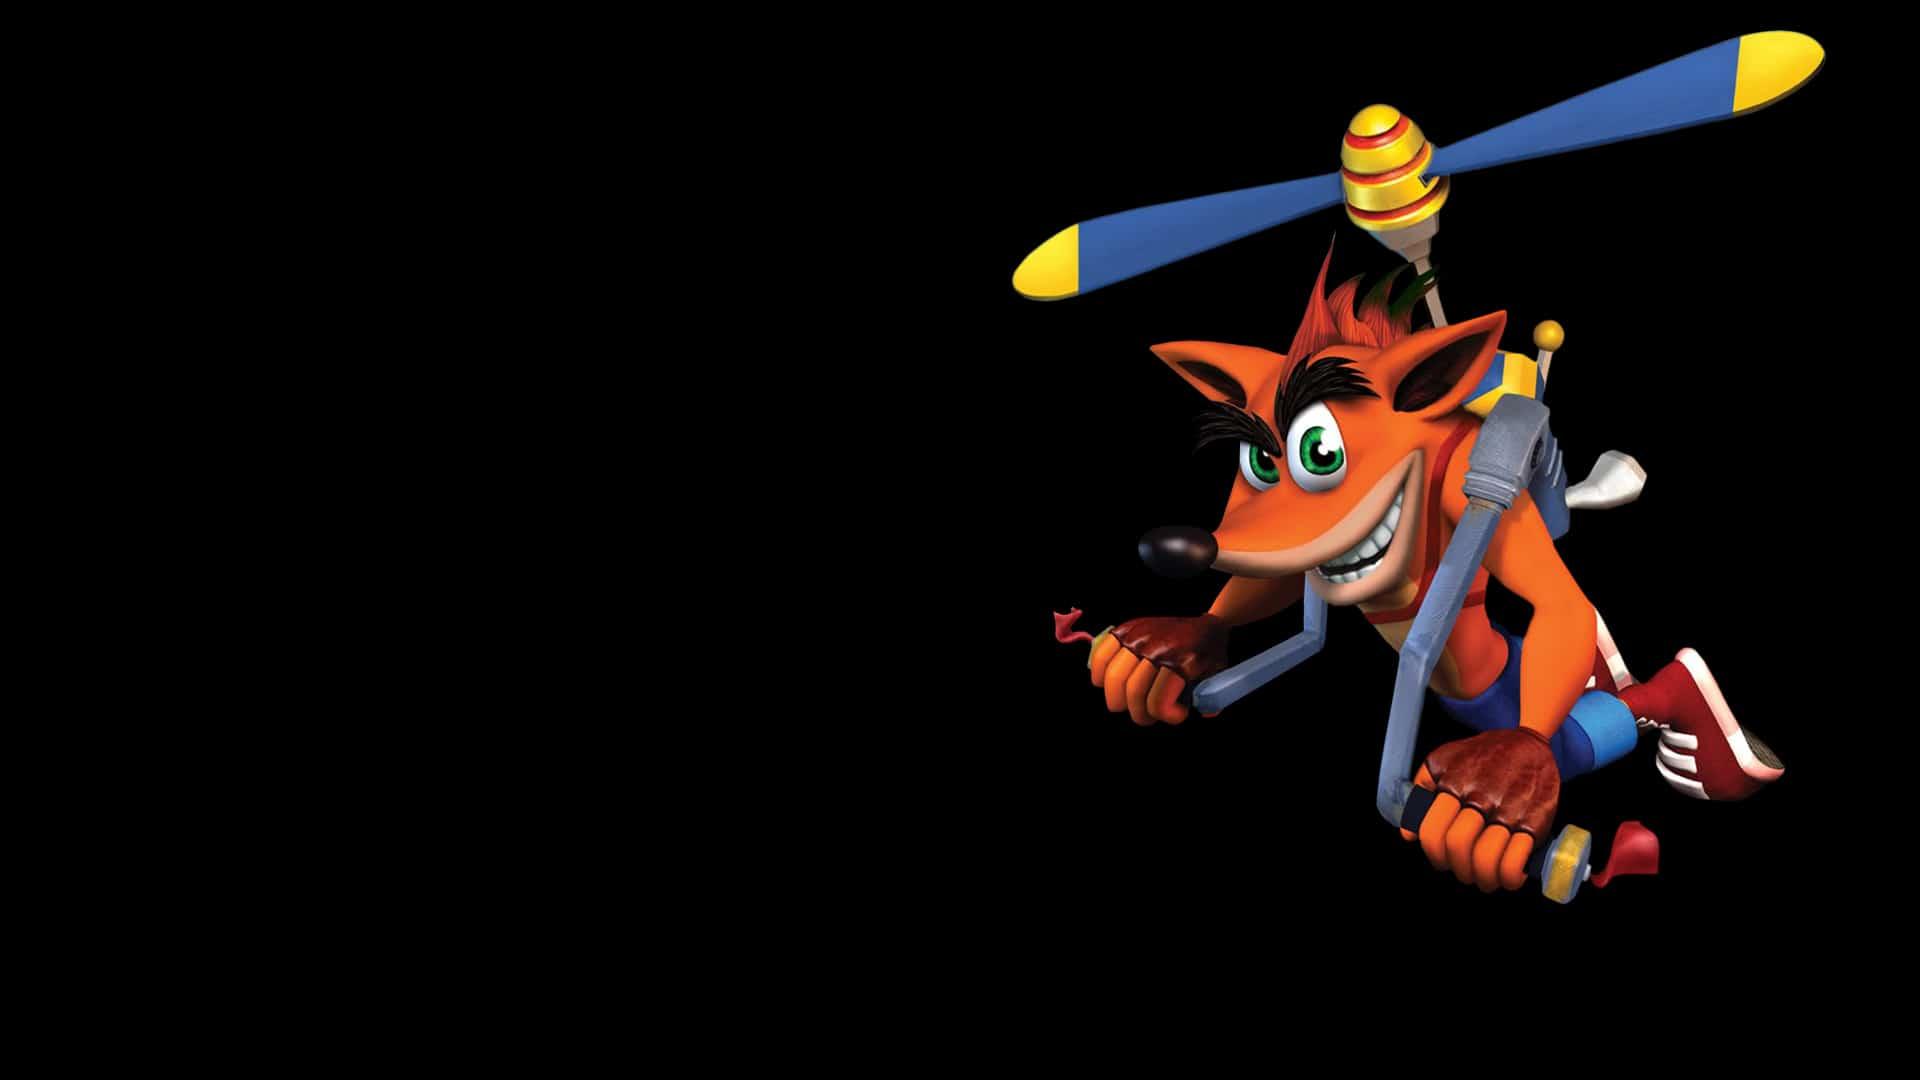 Crash-Bandicoot-Wallpaper-Free-Download